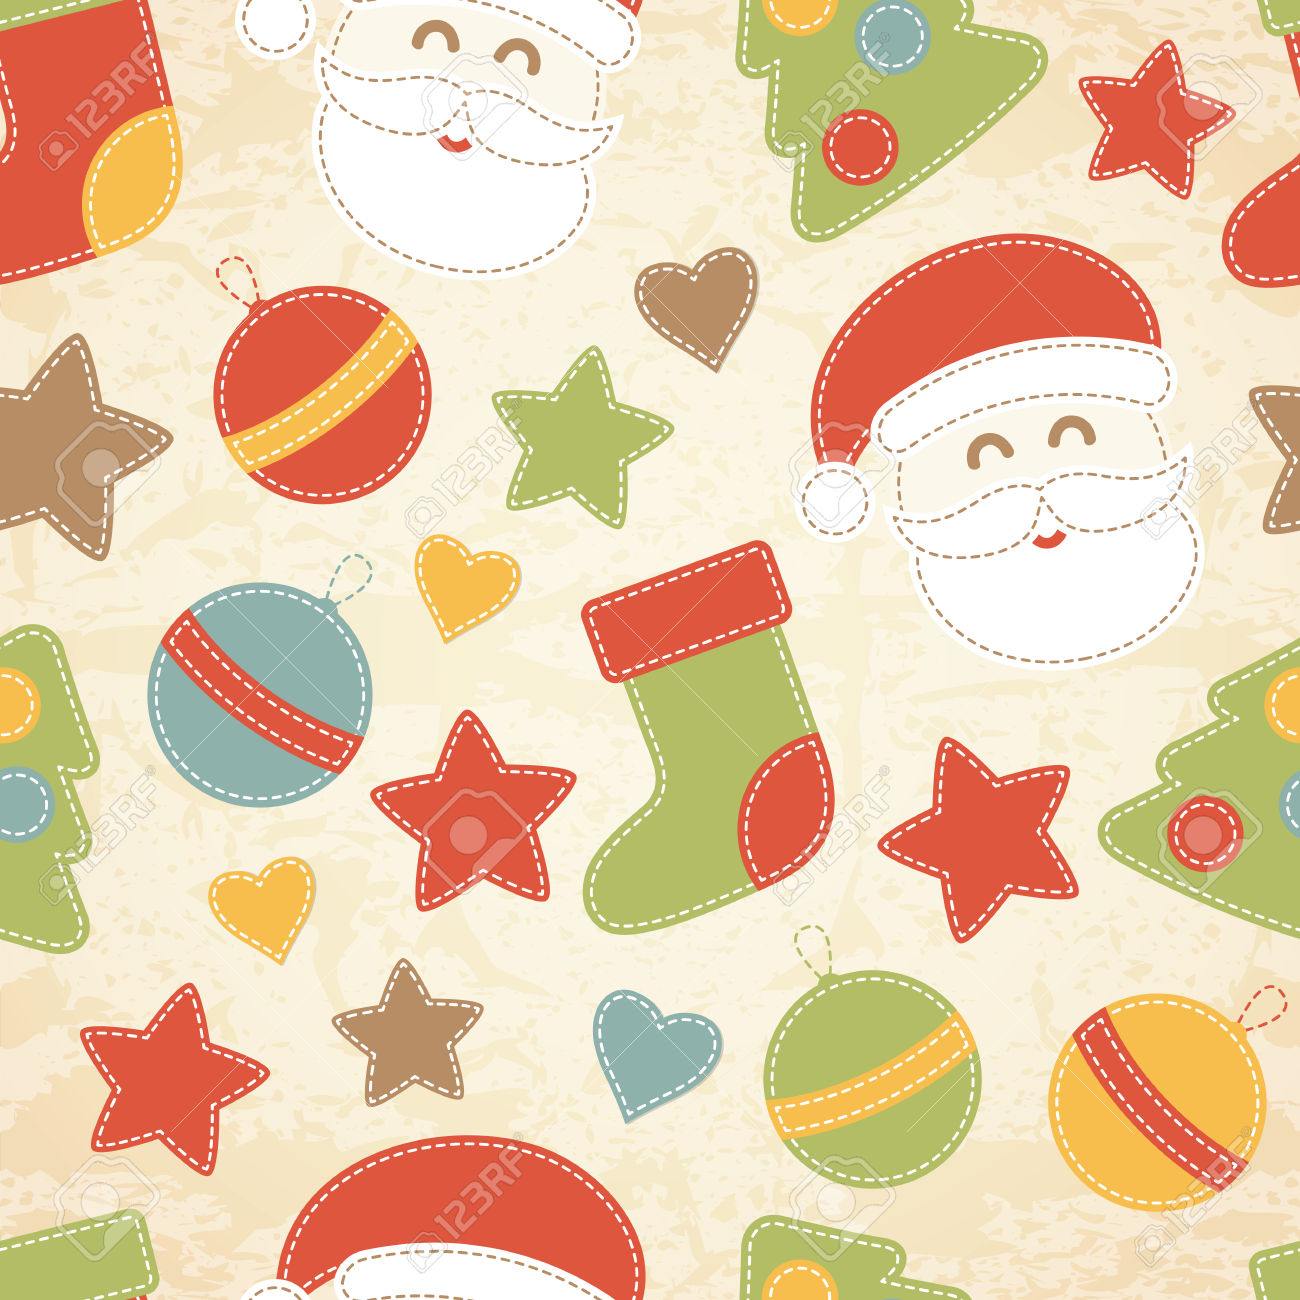 Childish Christmas Seamless Pattern With Santa Claus, Christmas.